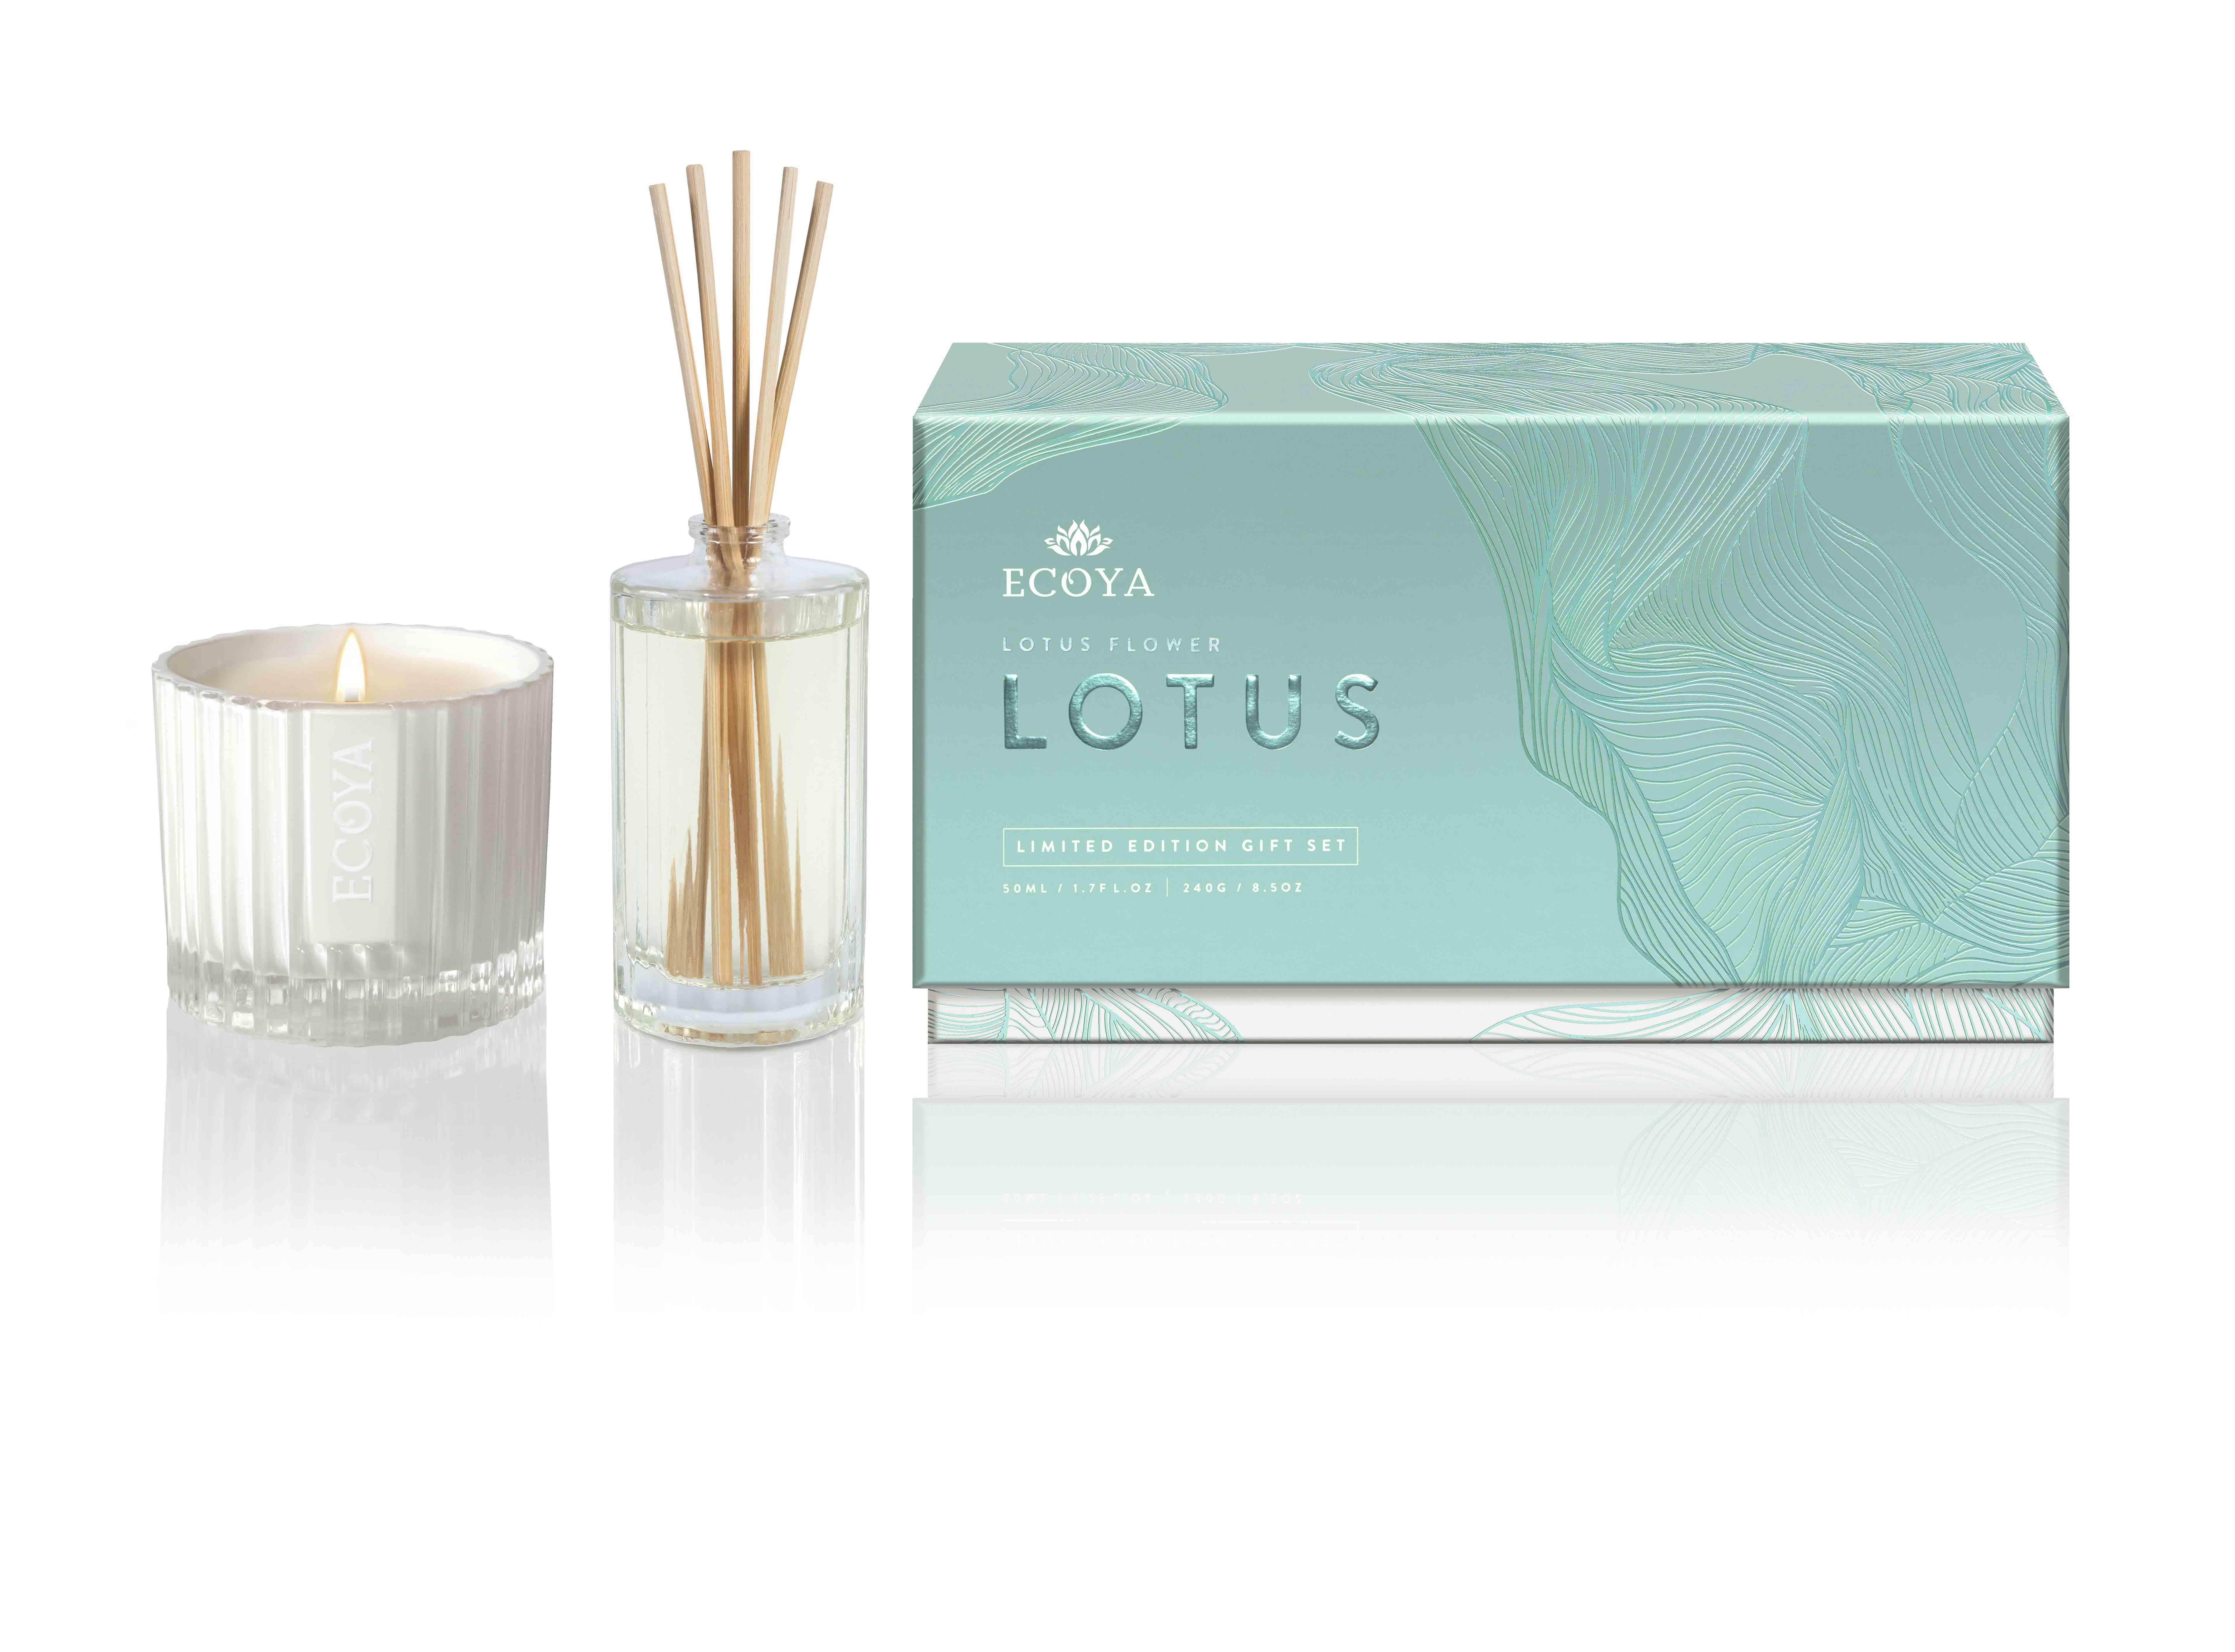 ecoya-limited-edition-gift-set-%c2%ad-lotus-flower-44-95au-or-54-95nz